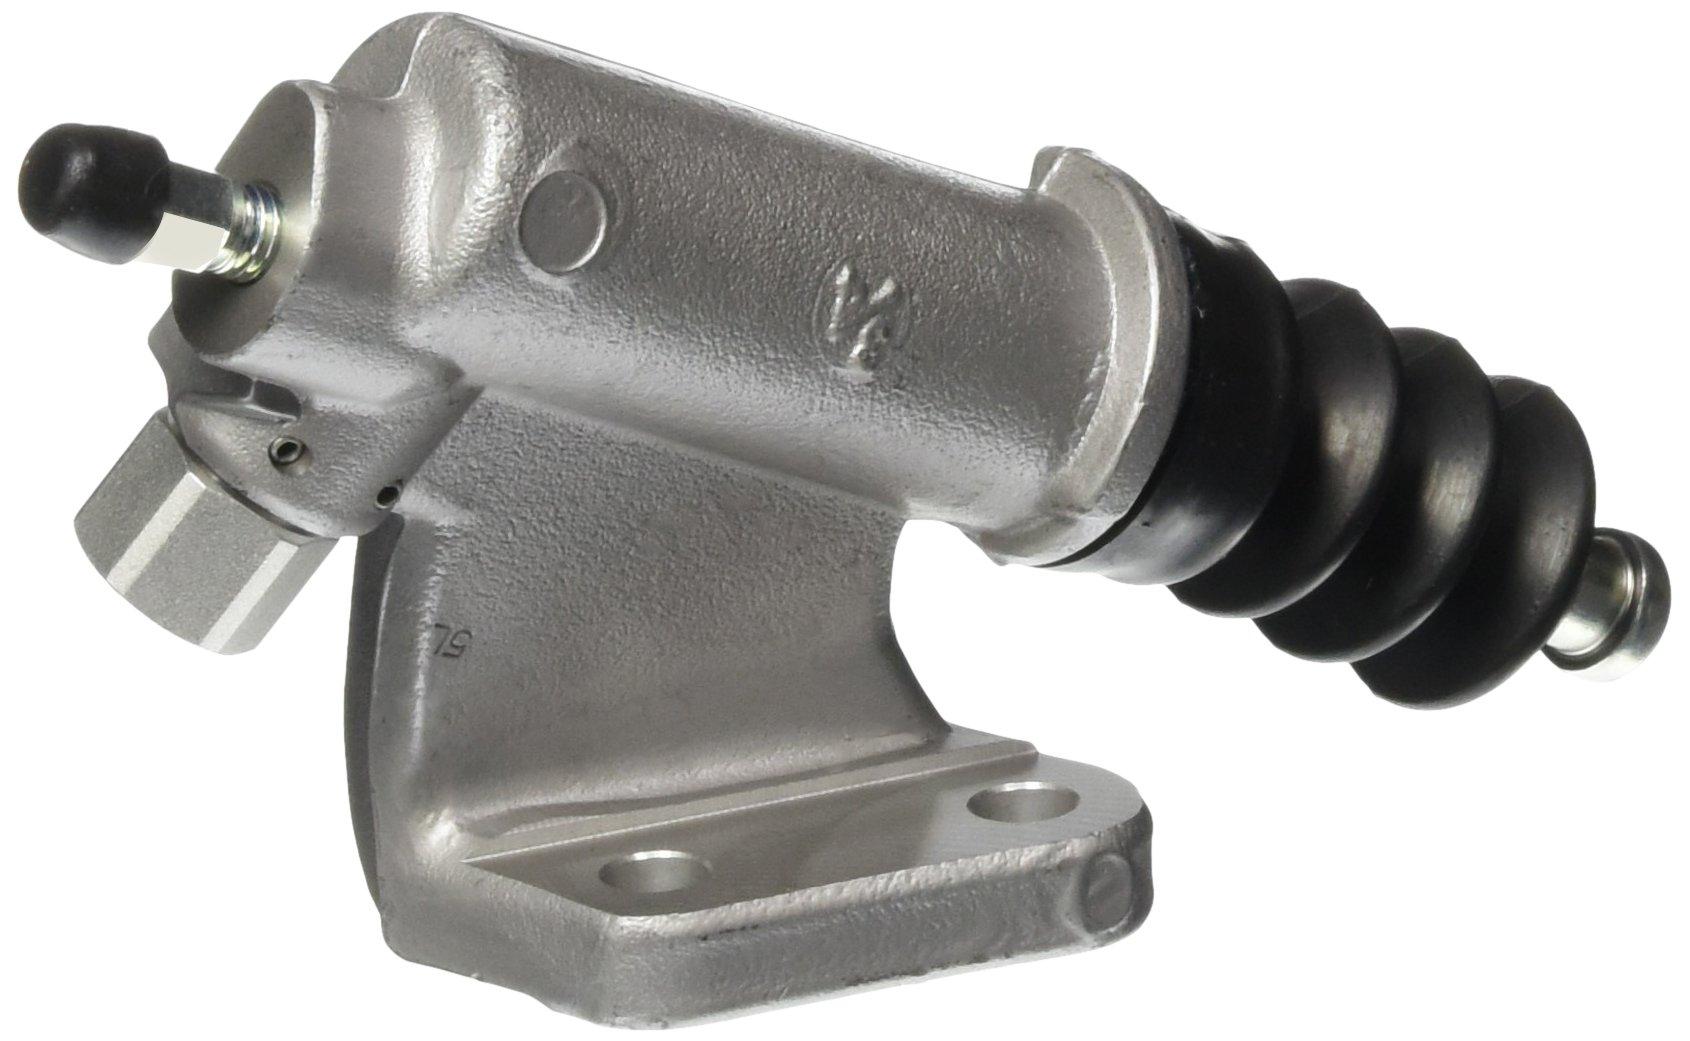 Genuine Honda 46930-S7C-E02 Clutch Slave Cylinder Assembly